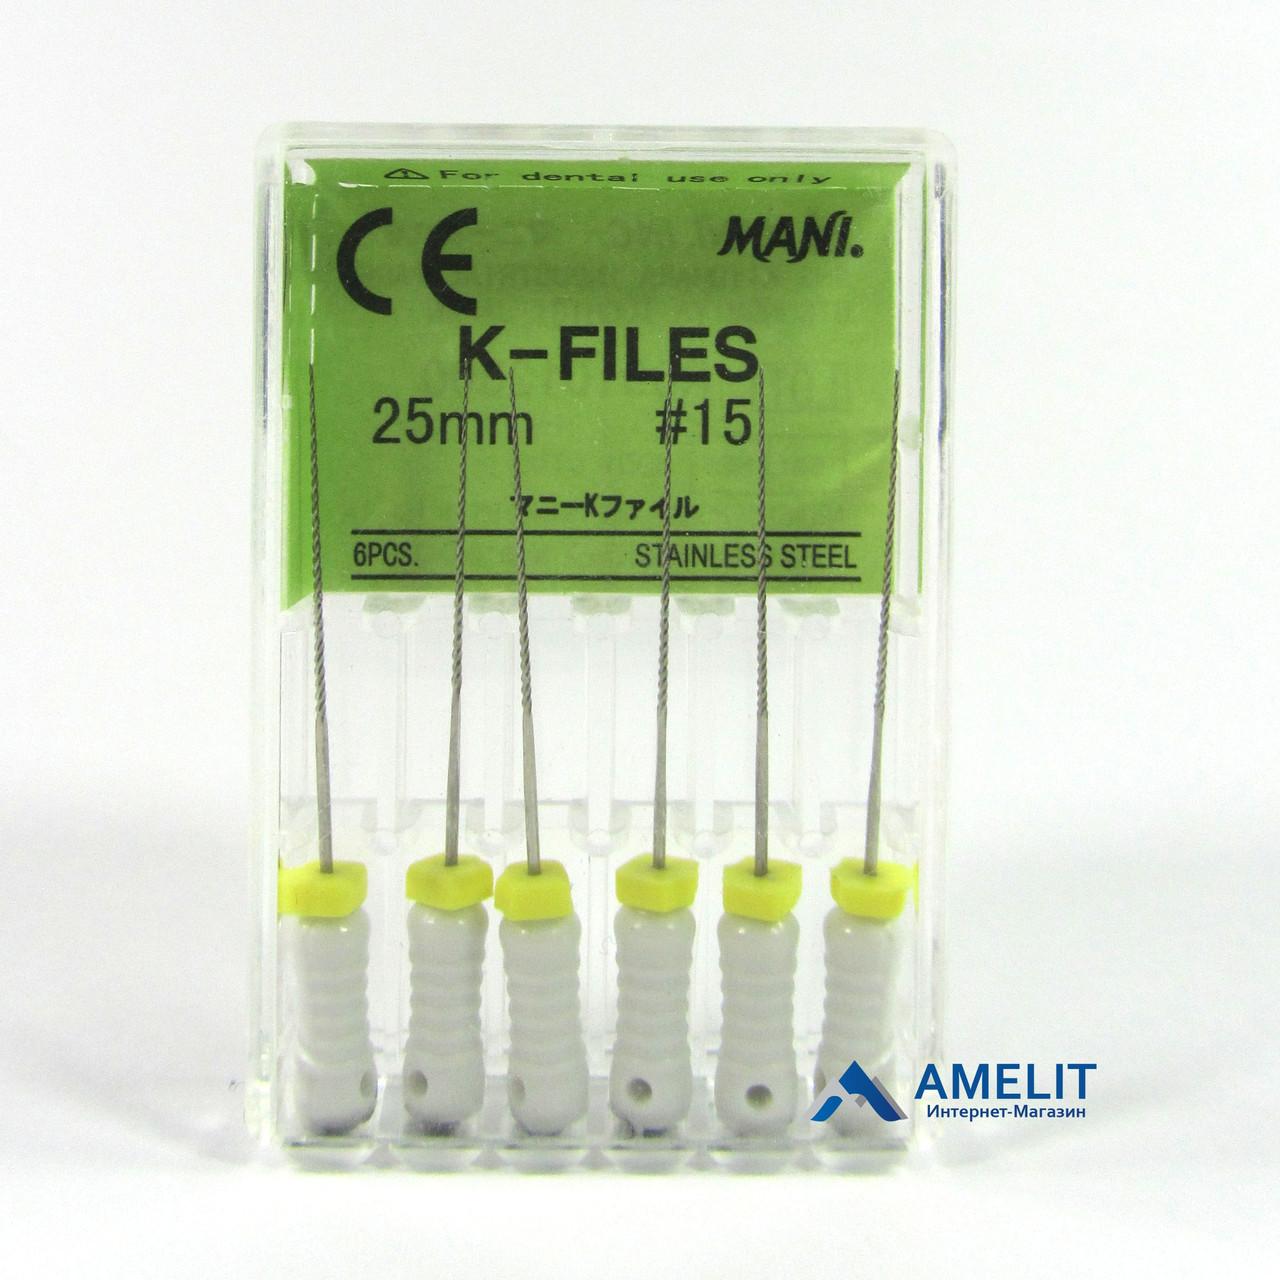 К-файл №15(К-file,Mani), 25мм, 6шт./уп